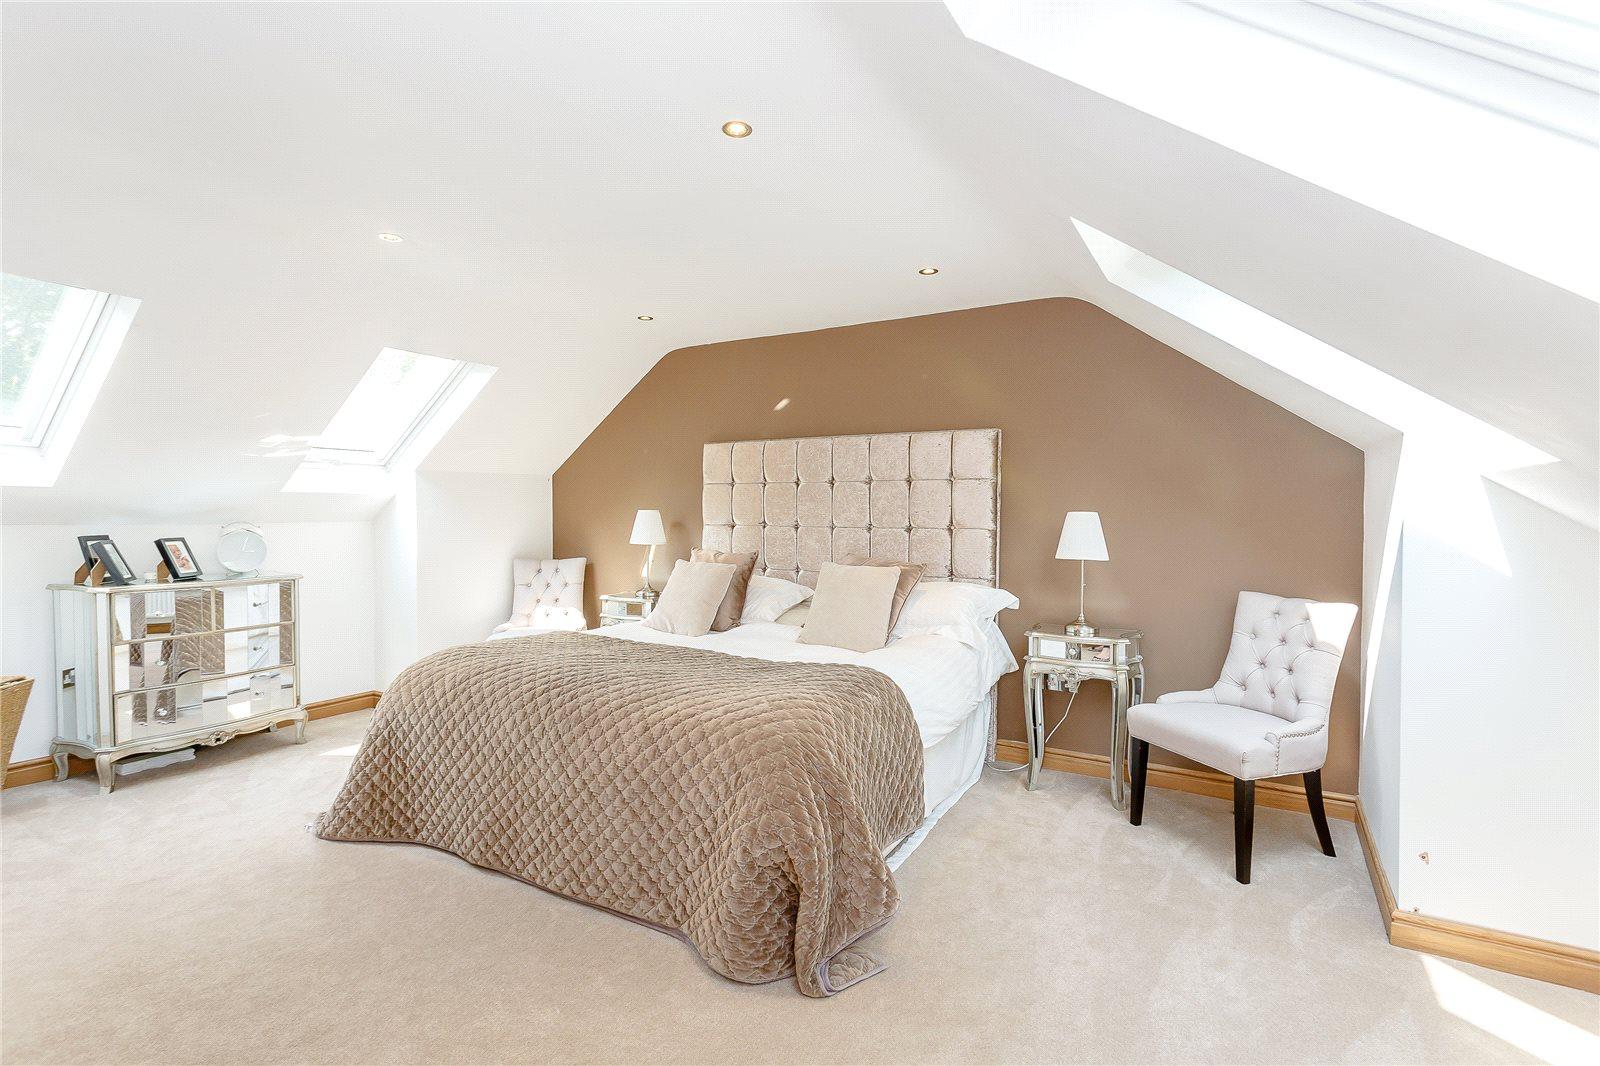 Home for sale in Harrogate, interior, bedroom